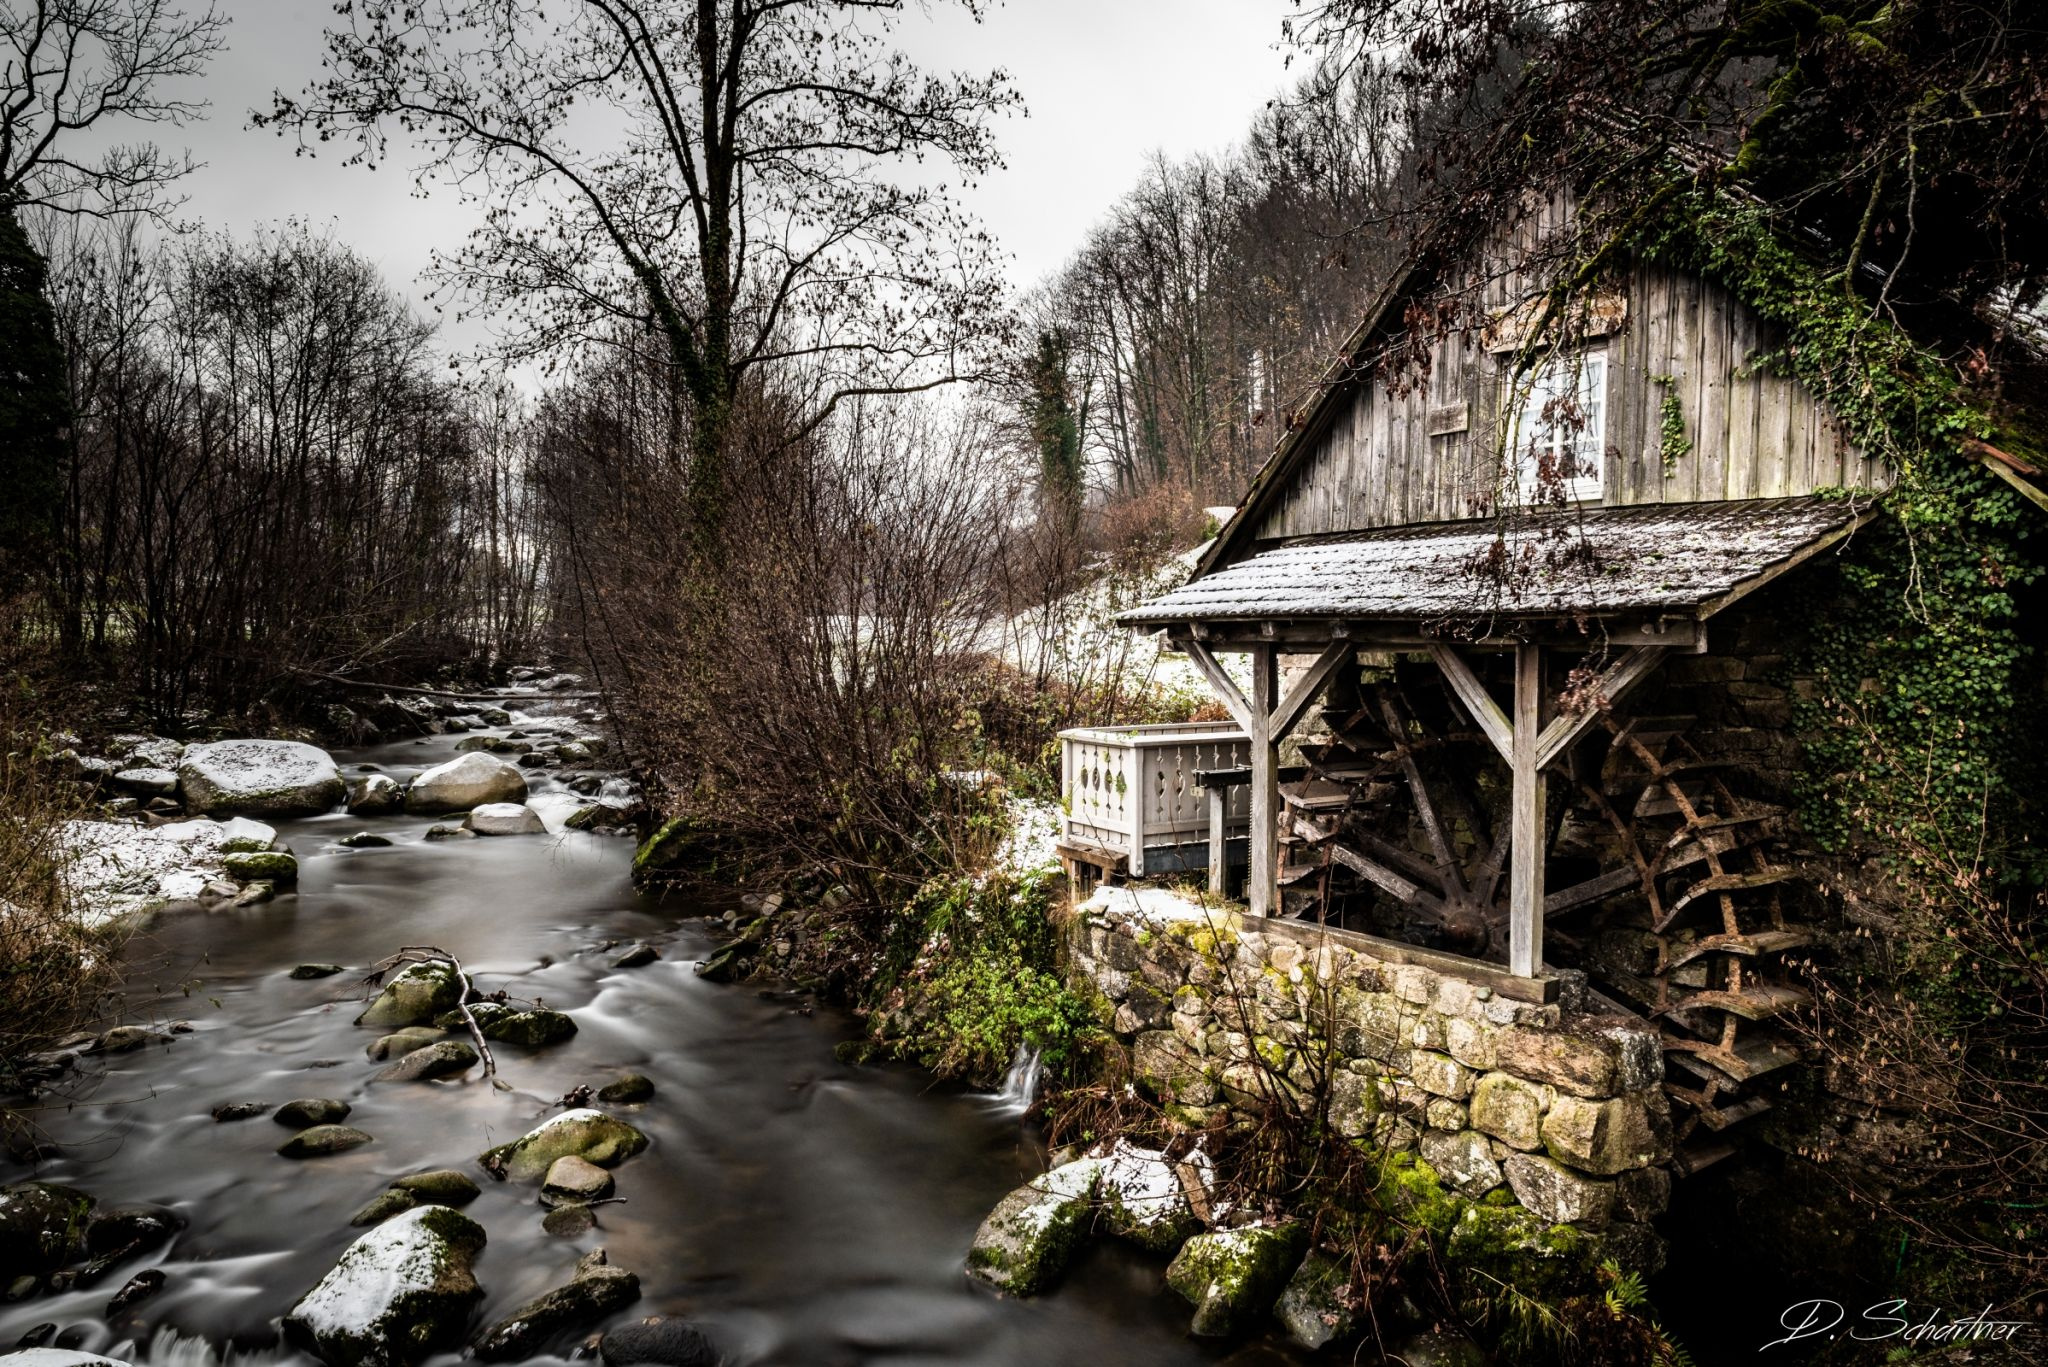 Rainbauernmühle, Germany